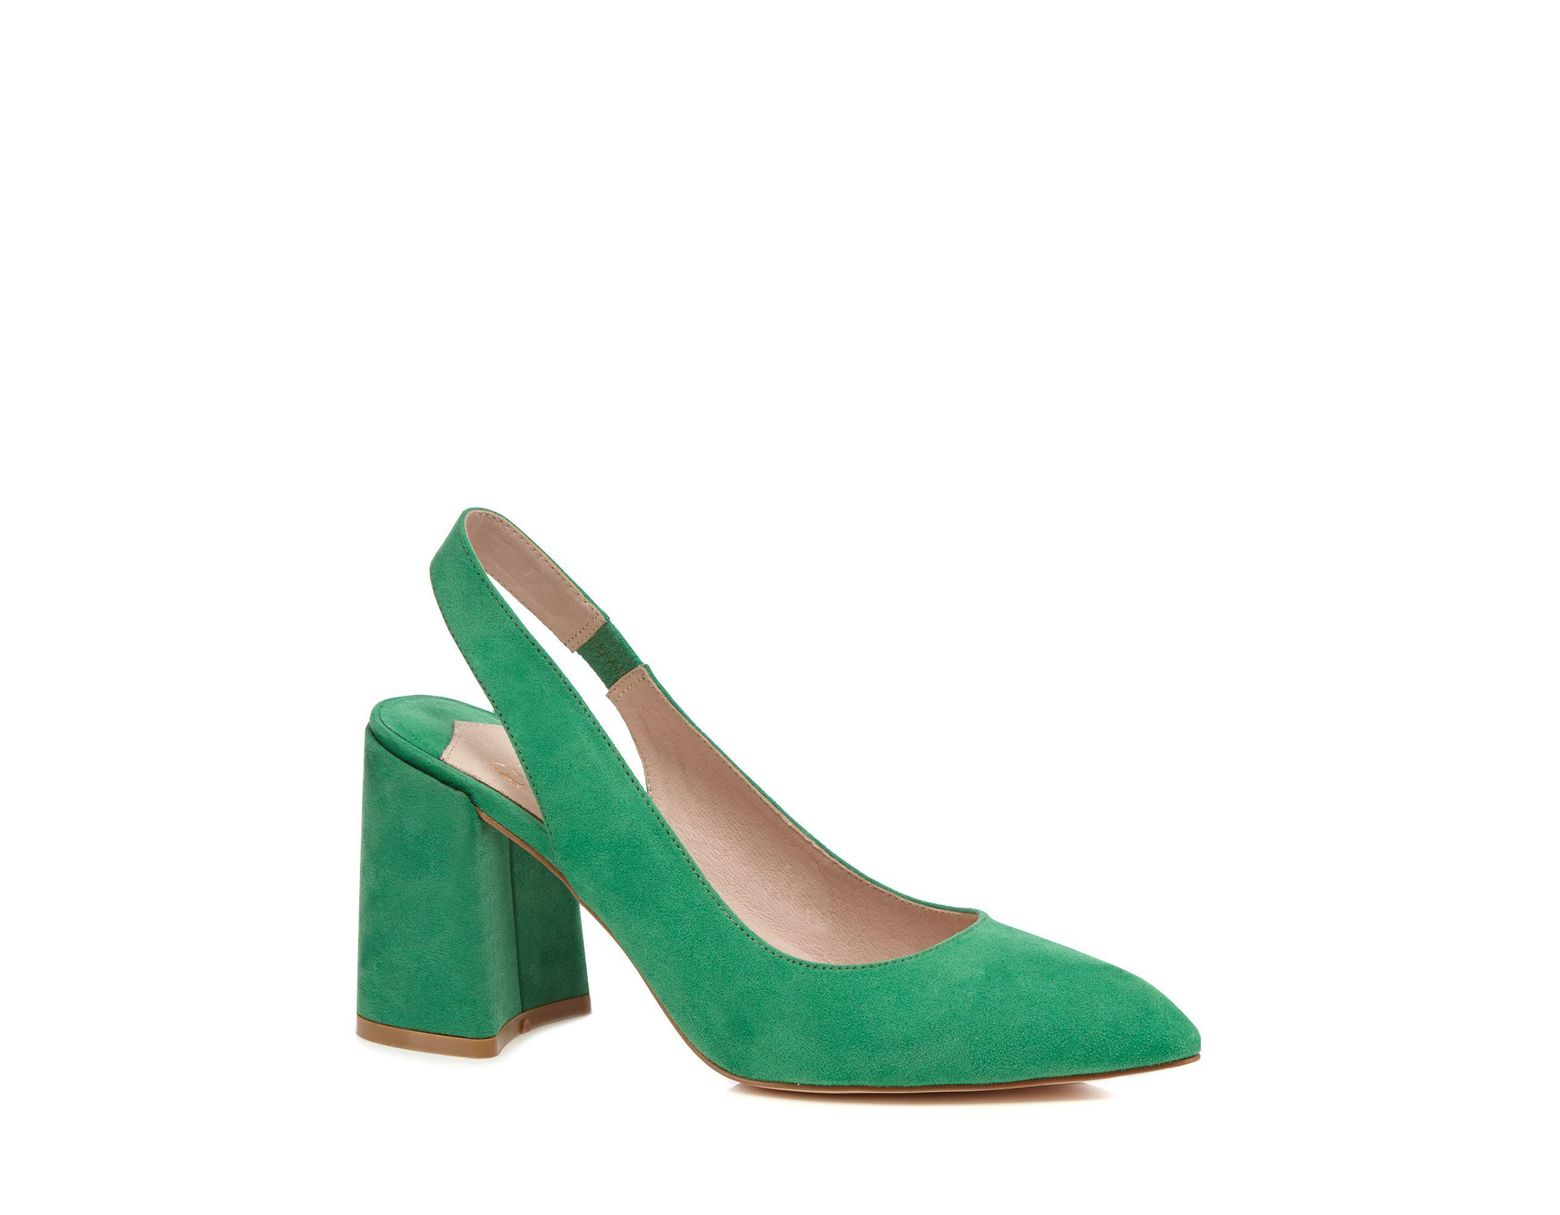 90a8b7e7ca Faith Green Suedette 'craig' High Block Heel Slingbacks in Green - Lyst